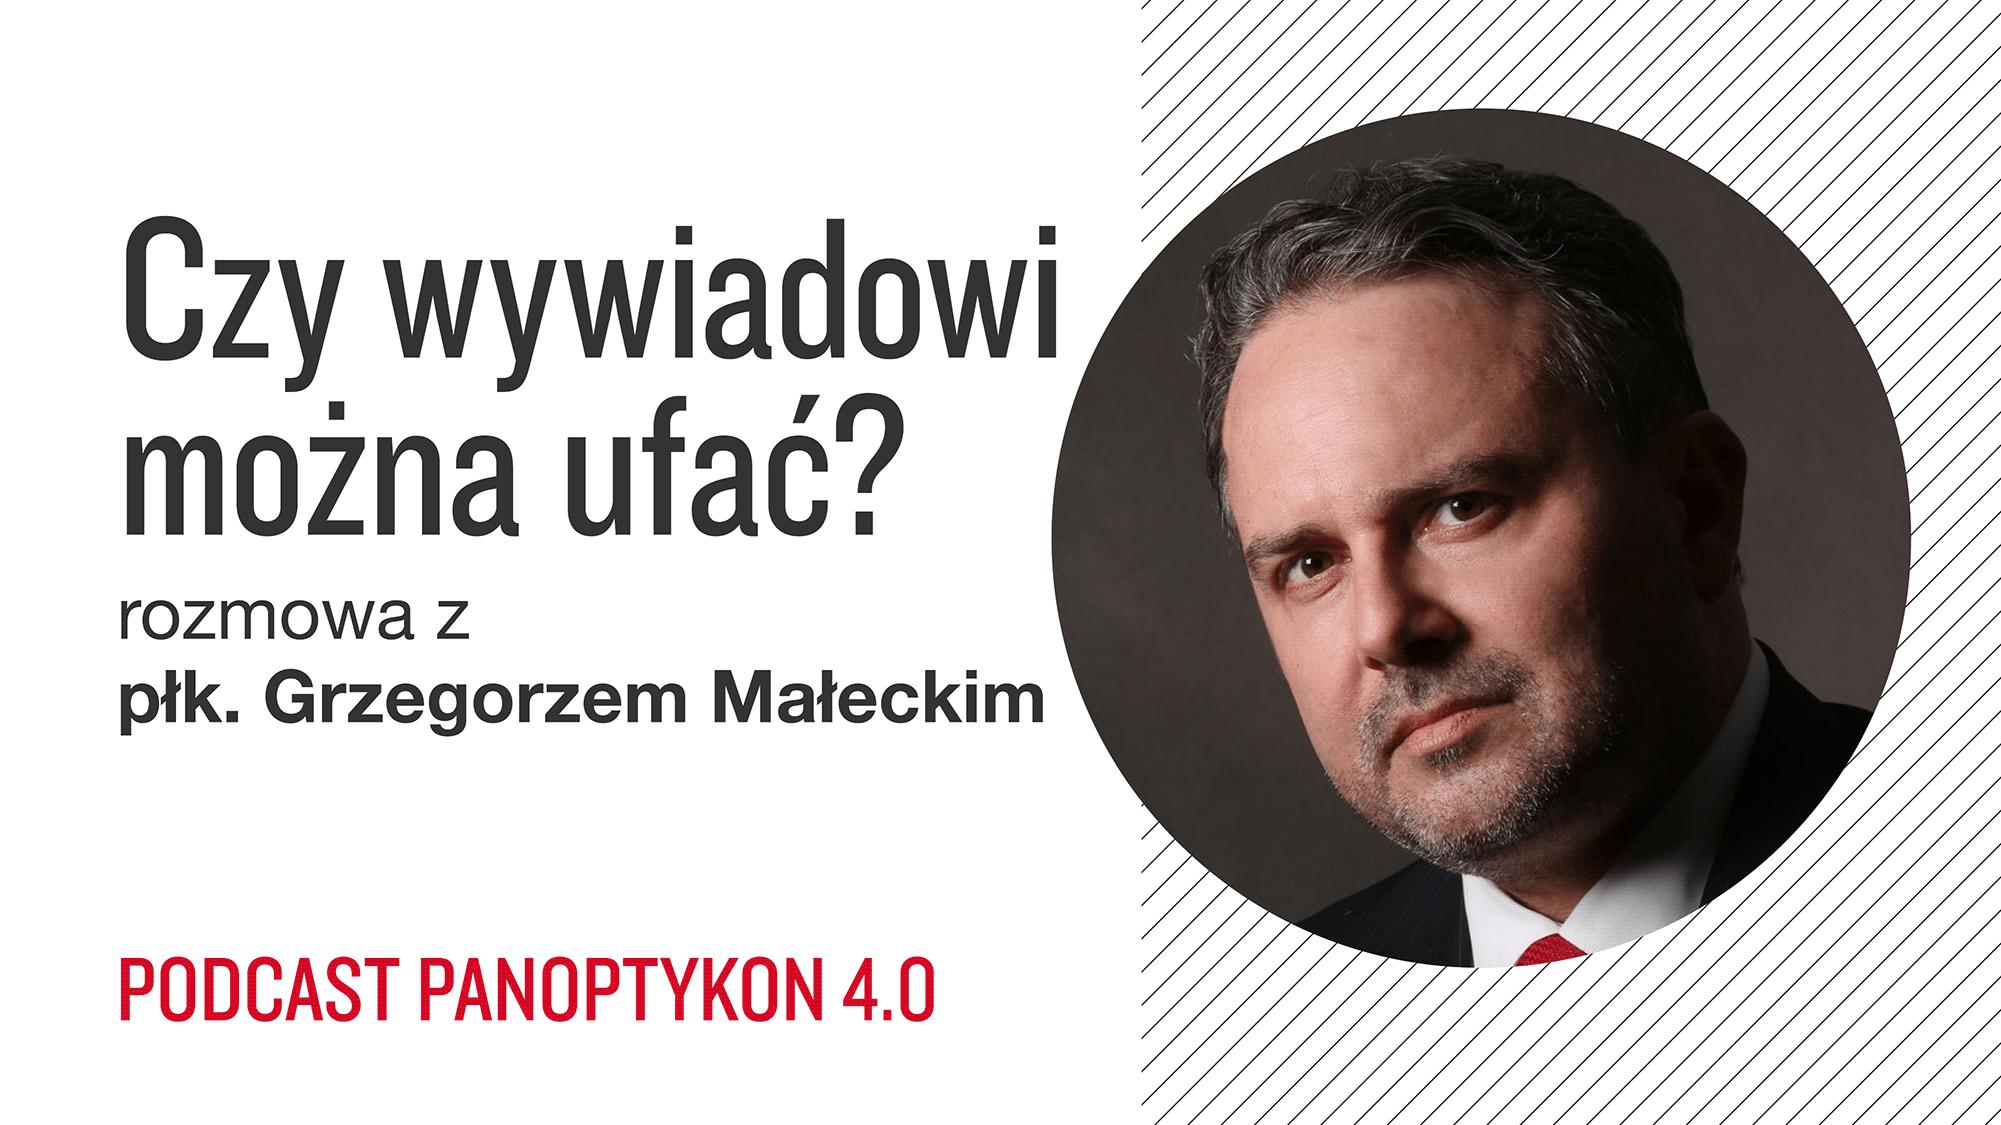 https://panoptykon.org/sites/default/files/panoptykon_40_grzegorz_malecki_wywiad_okladka.png